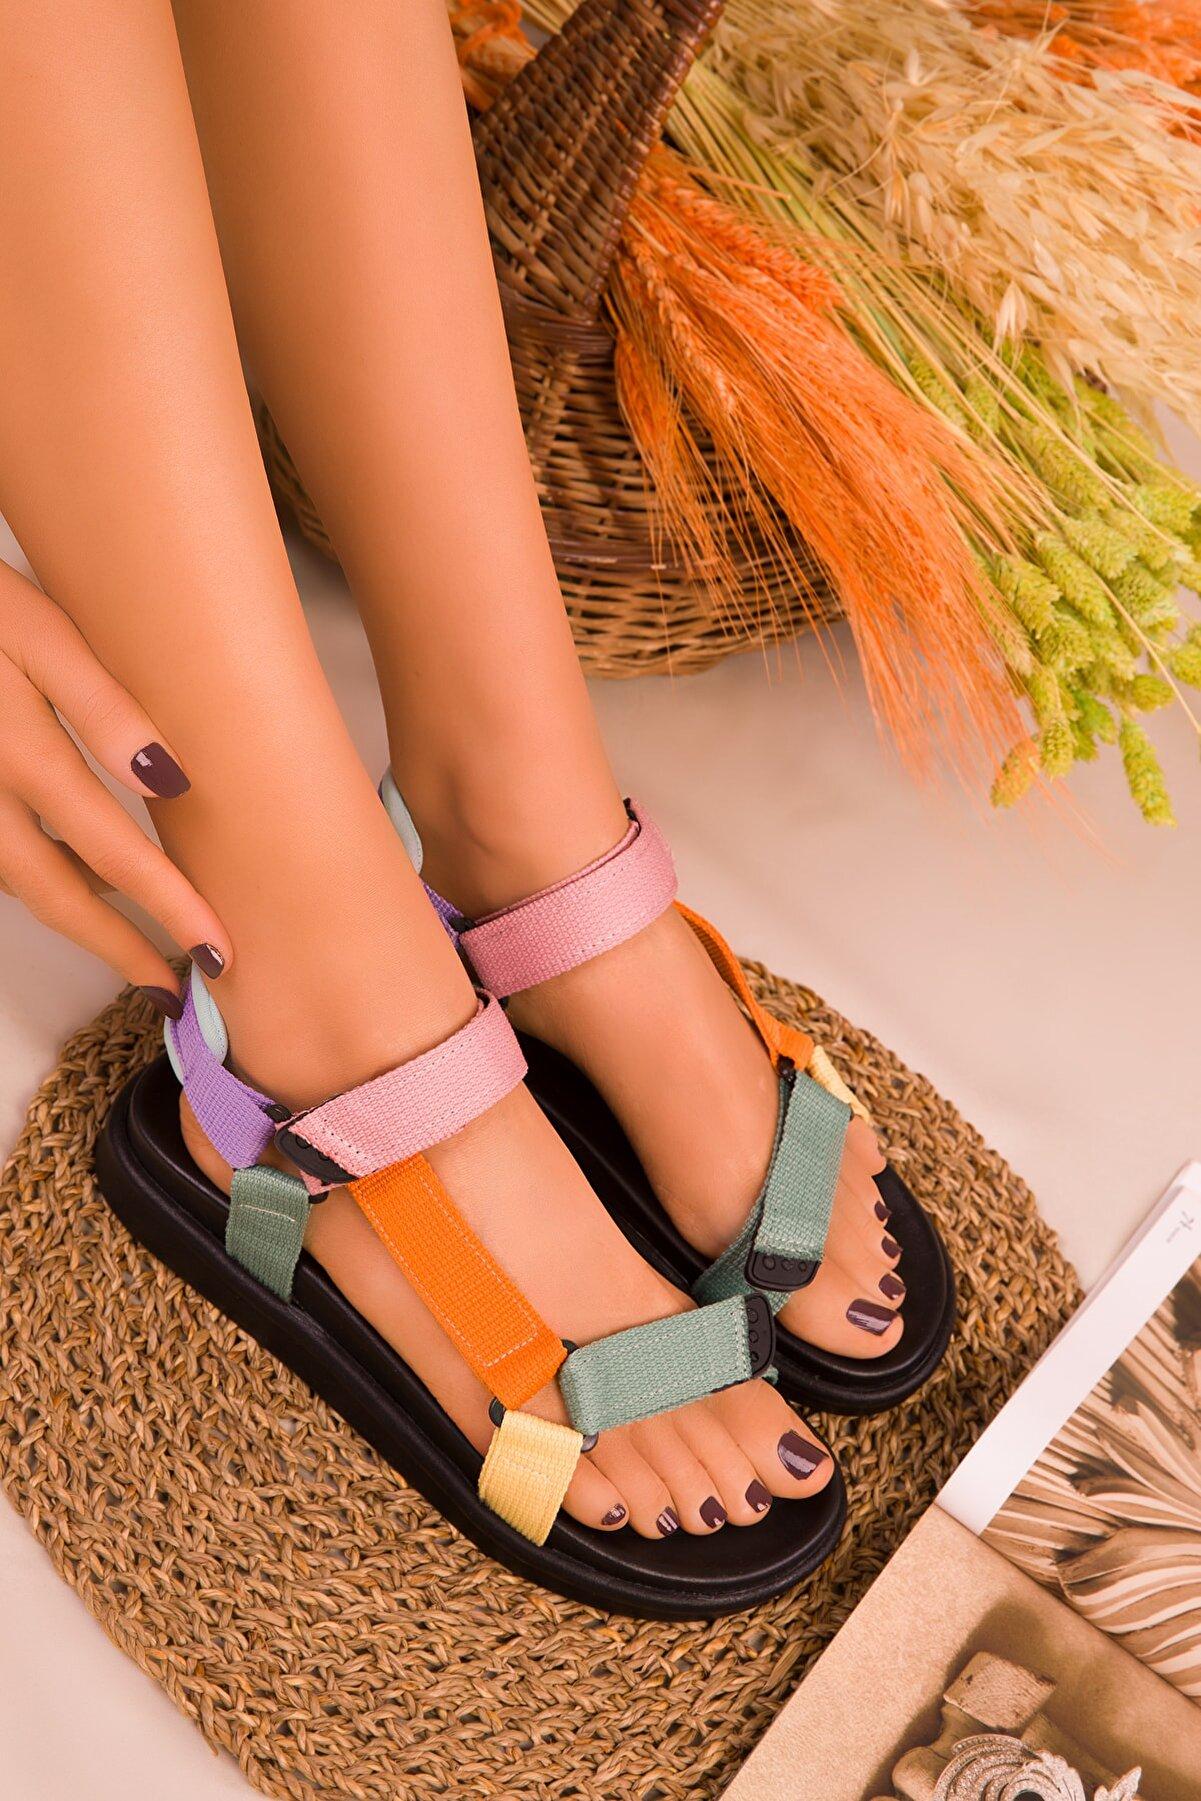 Soho Exclusive Siyah-Turuncu-Pudra Kadın Sandalet 16288